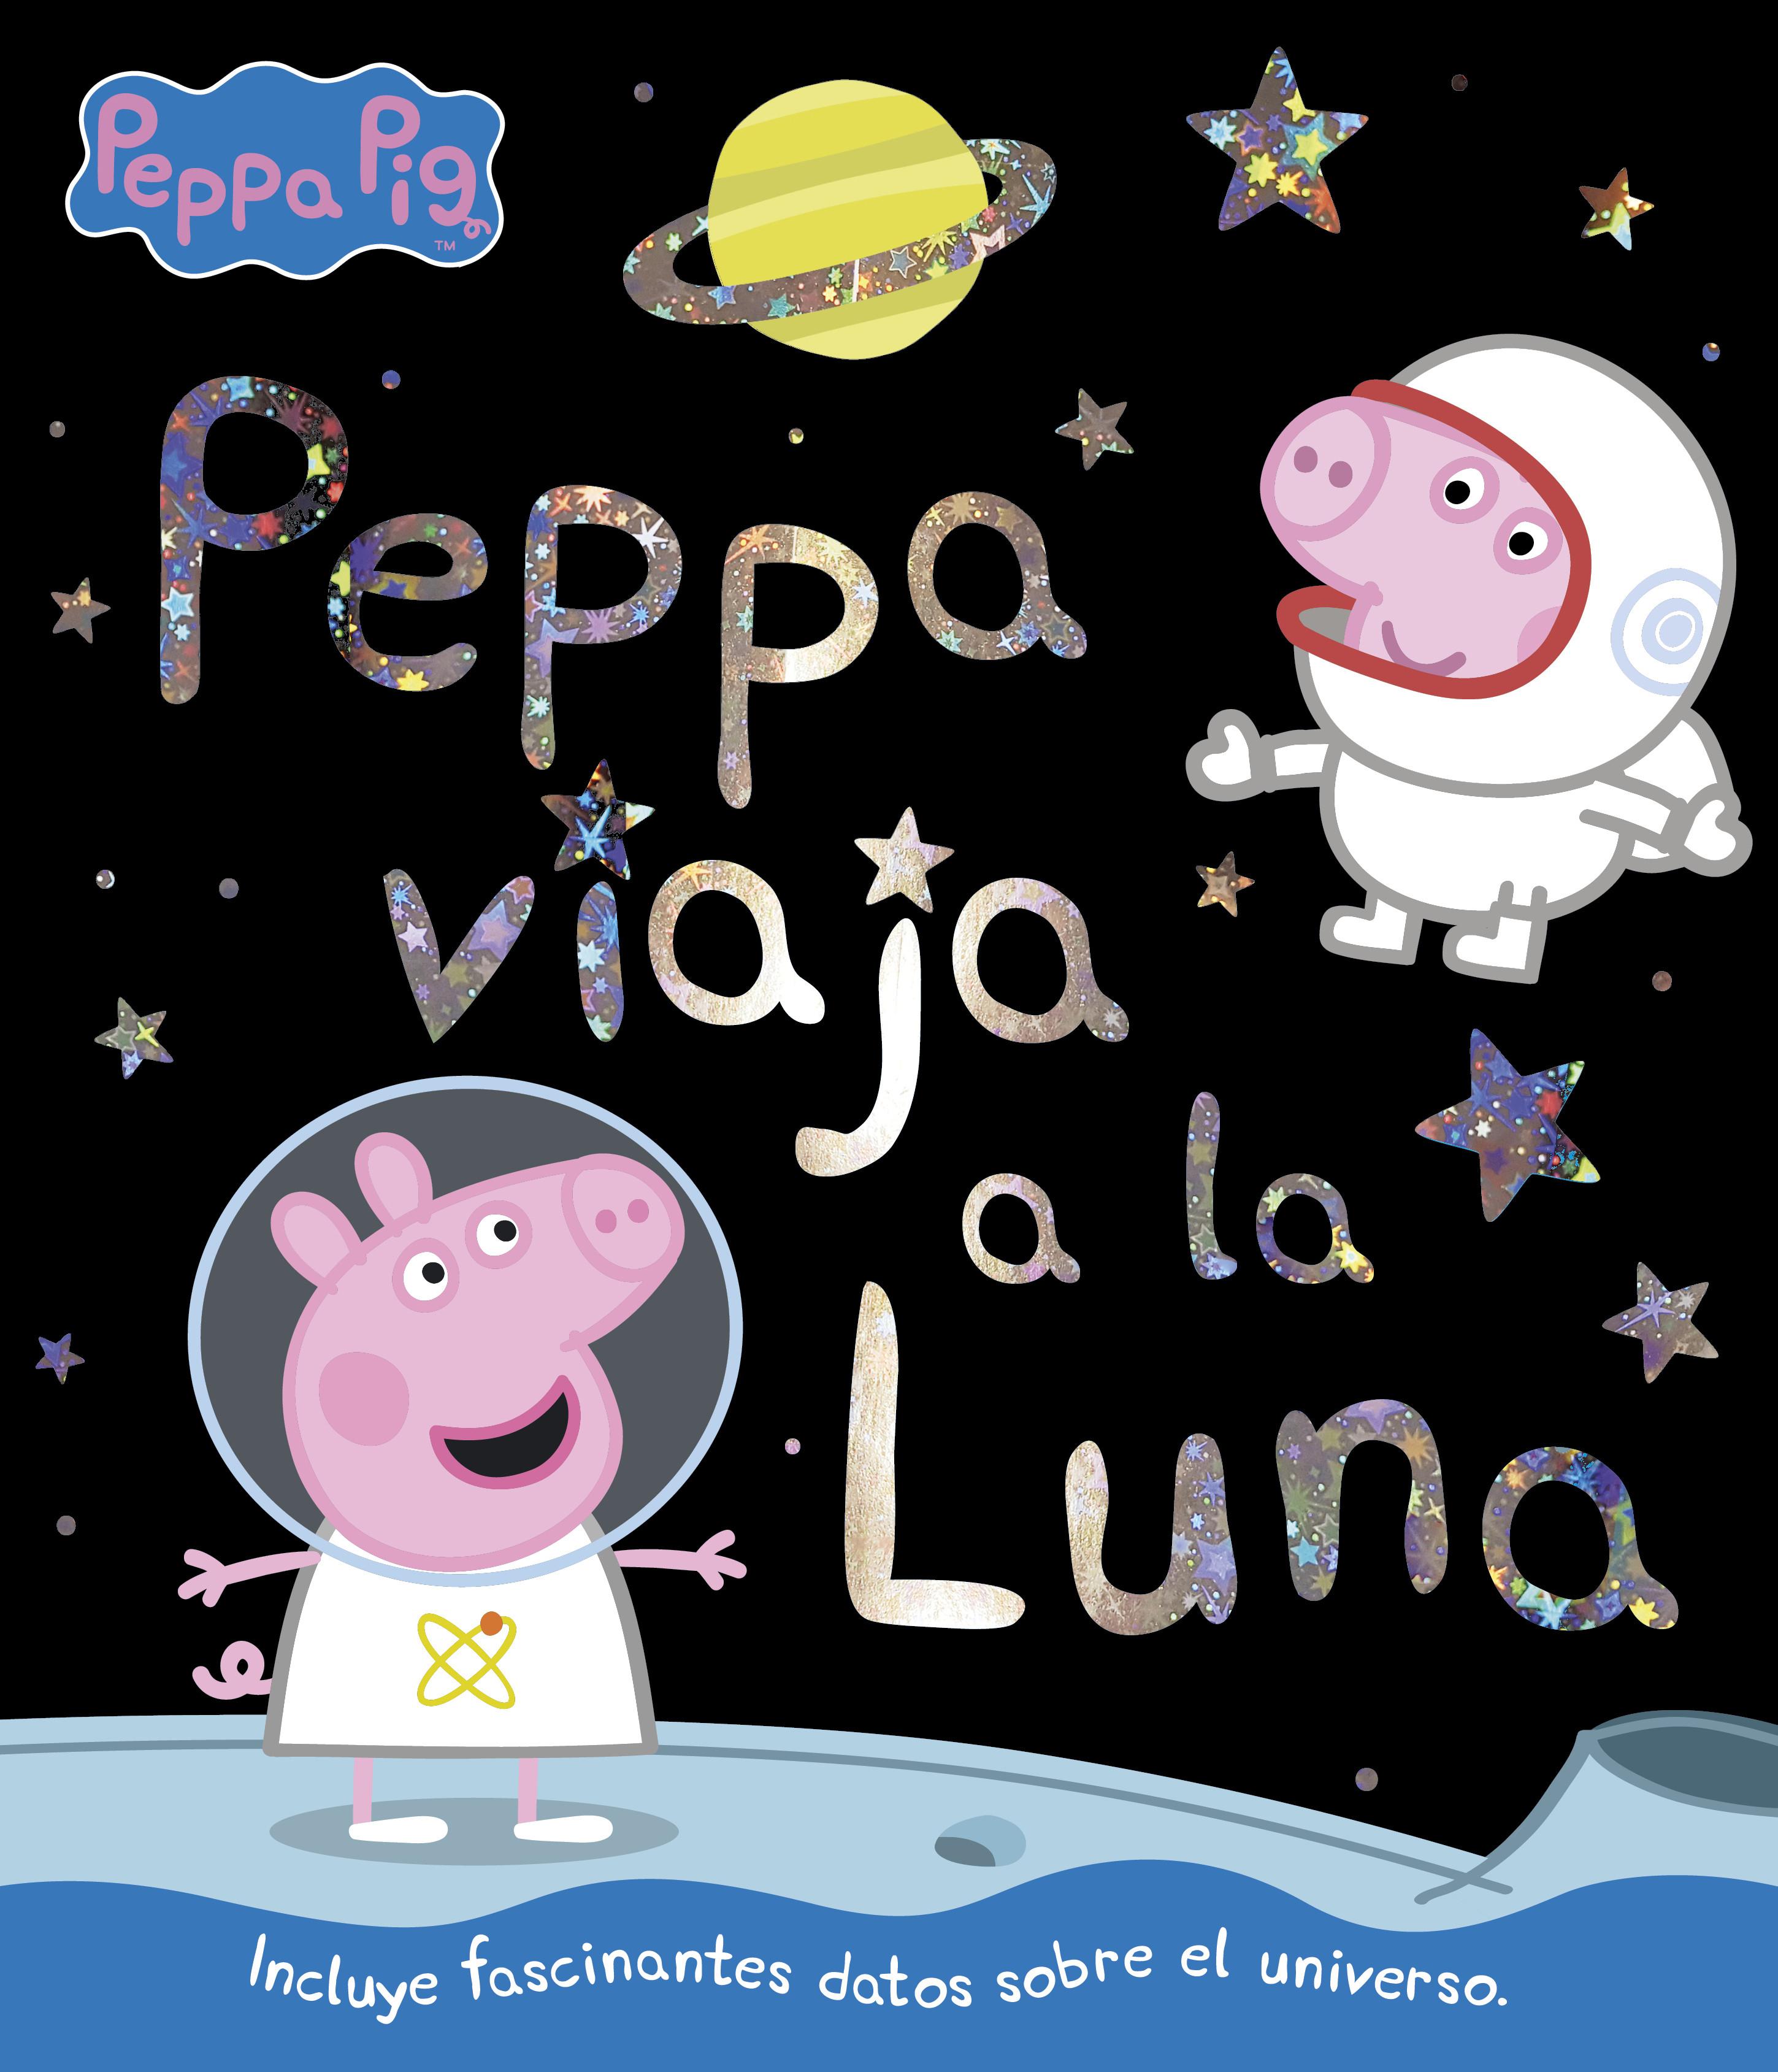 Peppa viaja a la luna (Un cuento de Peppa Pig)